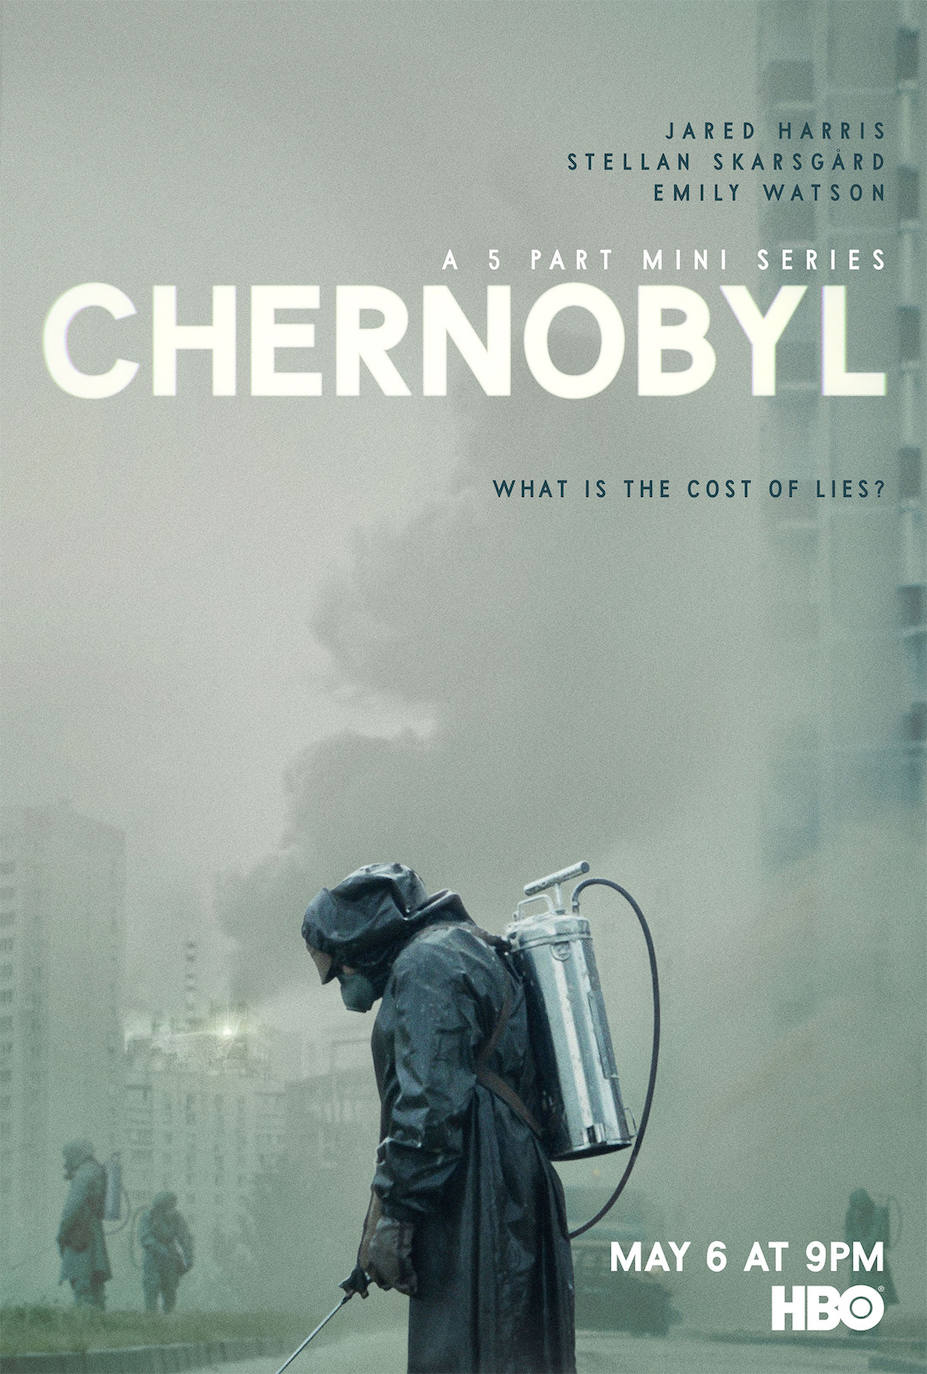 Las 20 mejores series según IMDb